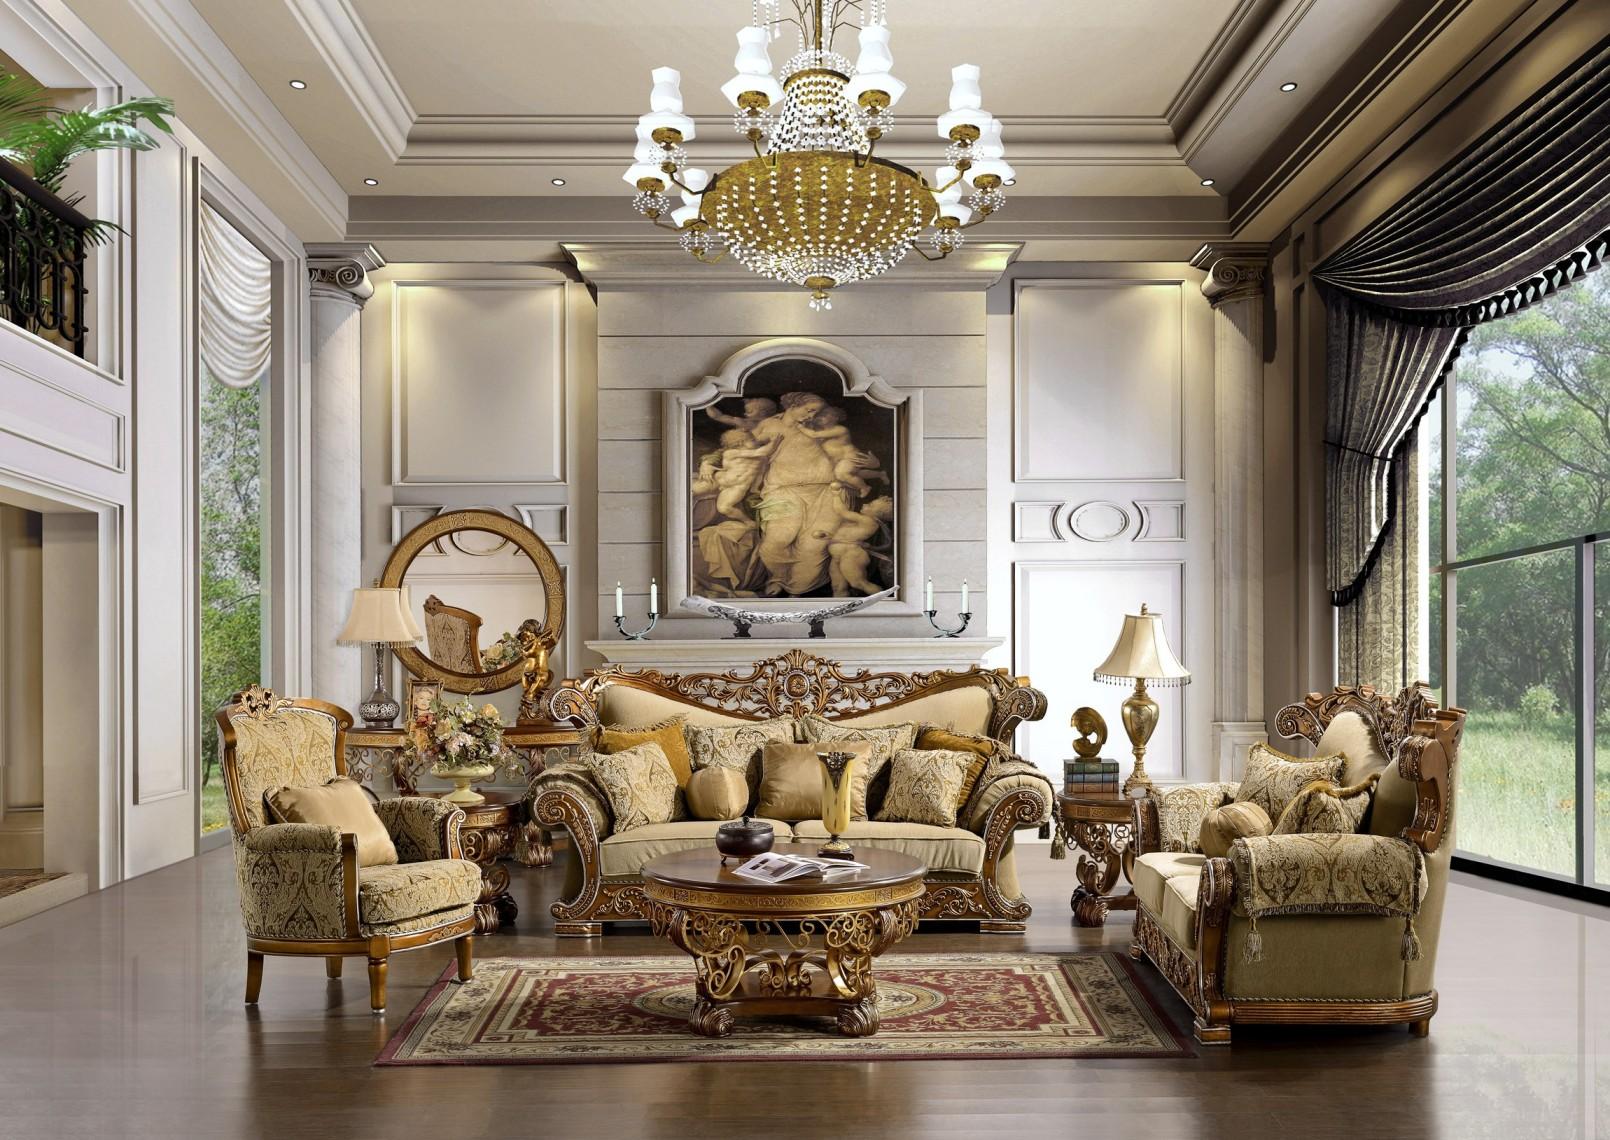 Elegant Living Room Ideas & Elegant Living Room Ideas - Fotolip.com Rich image and wallpaper